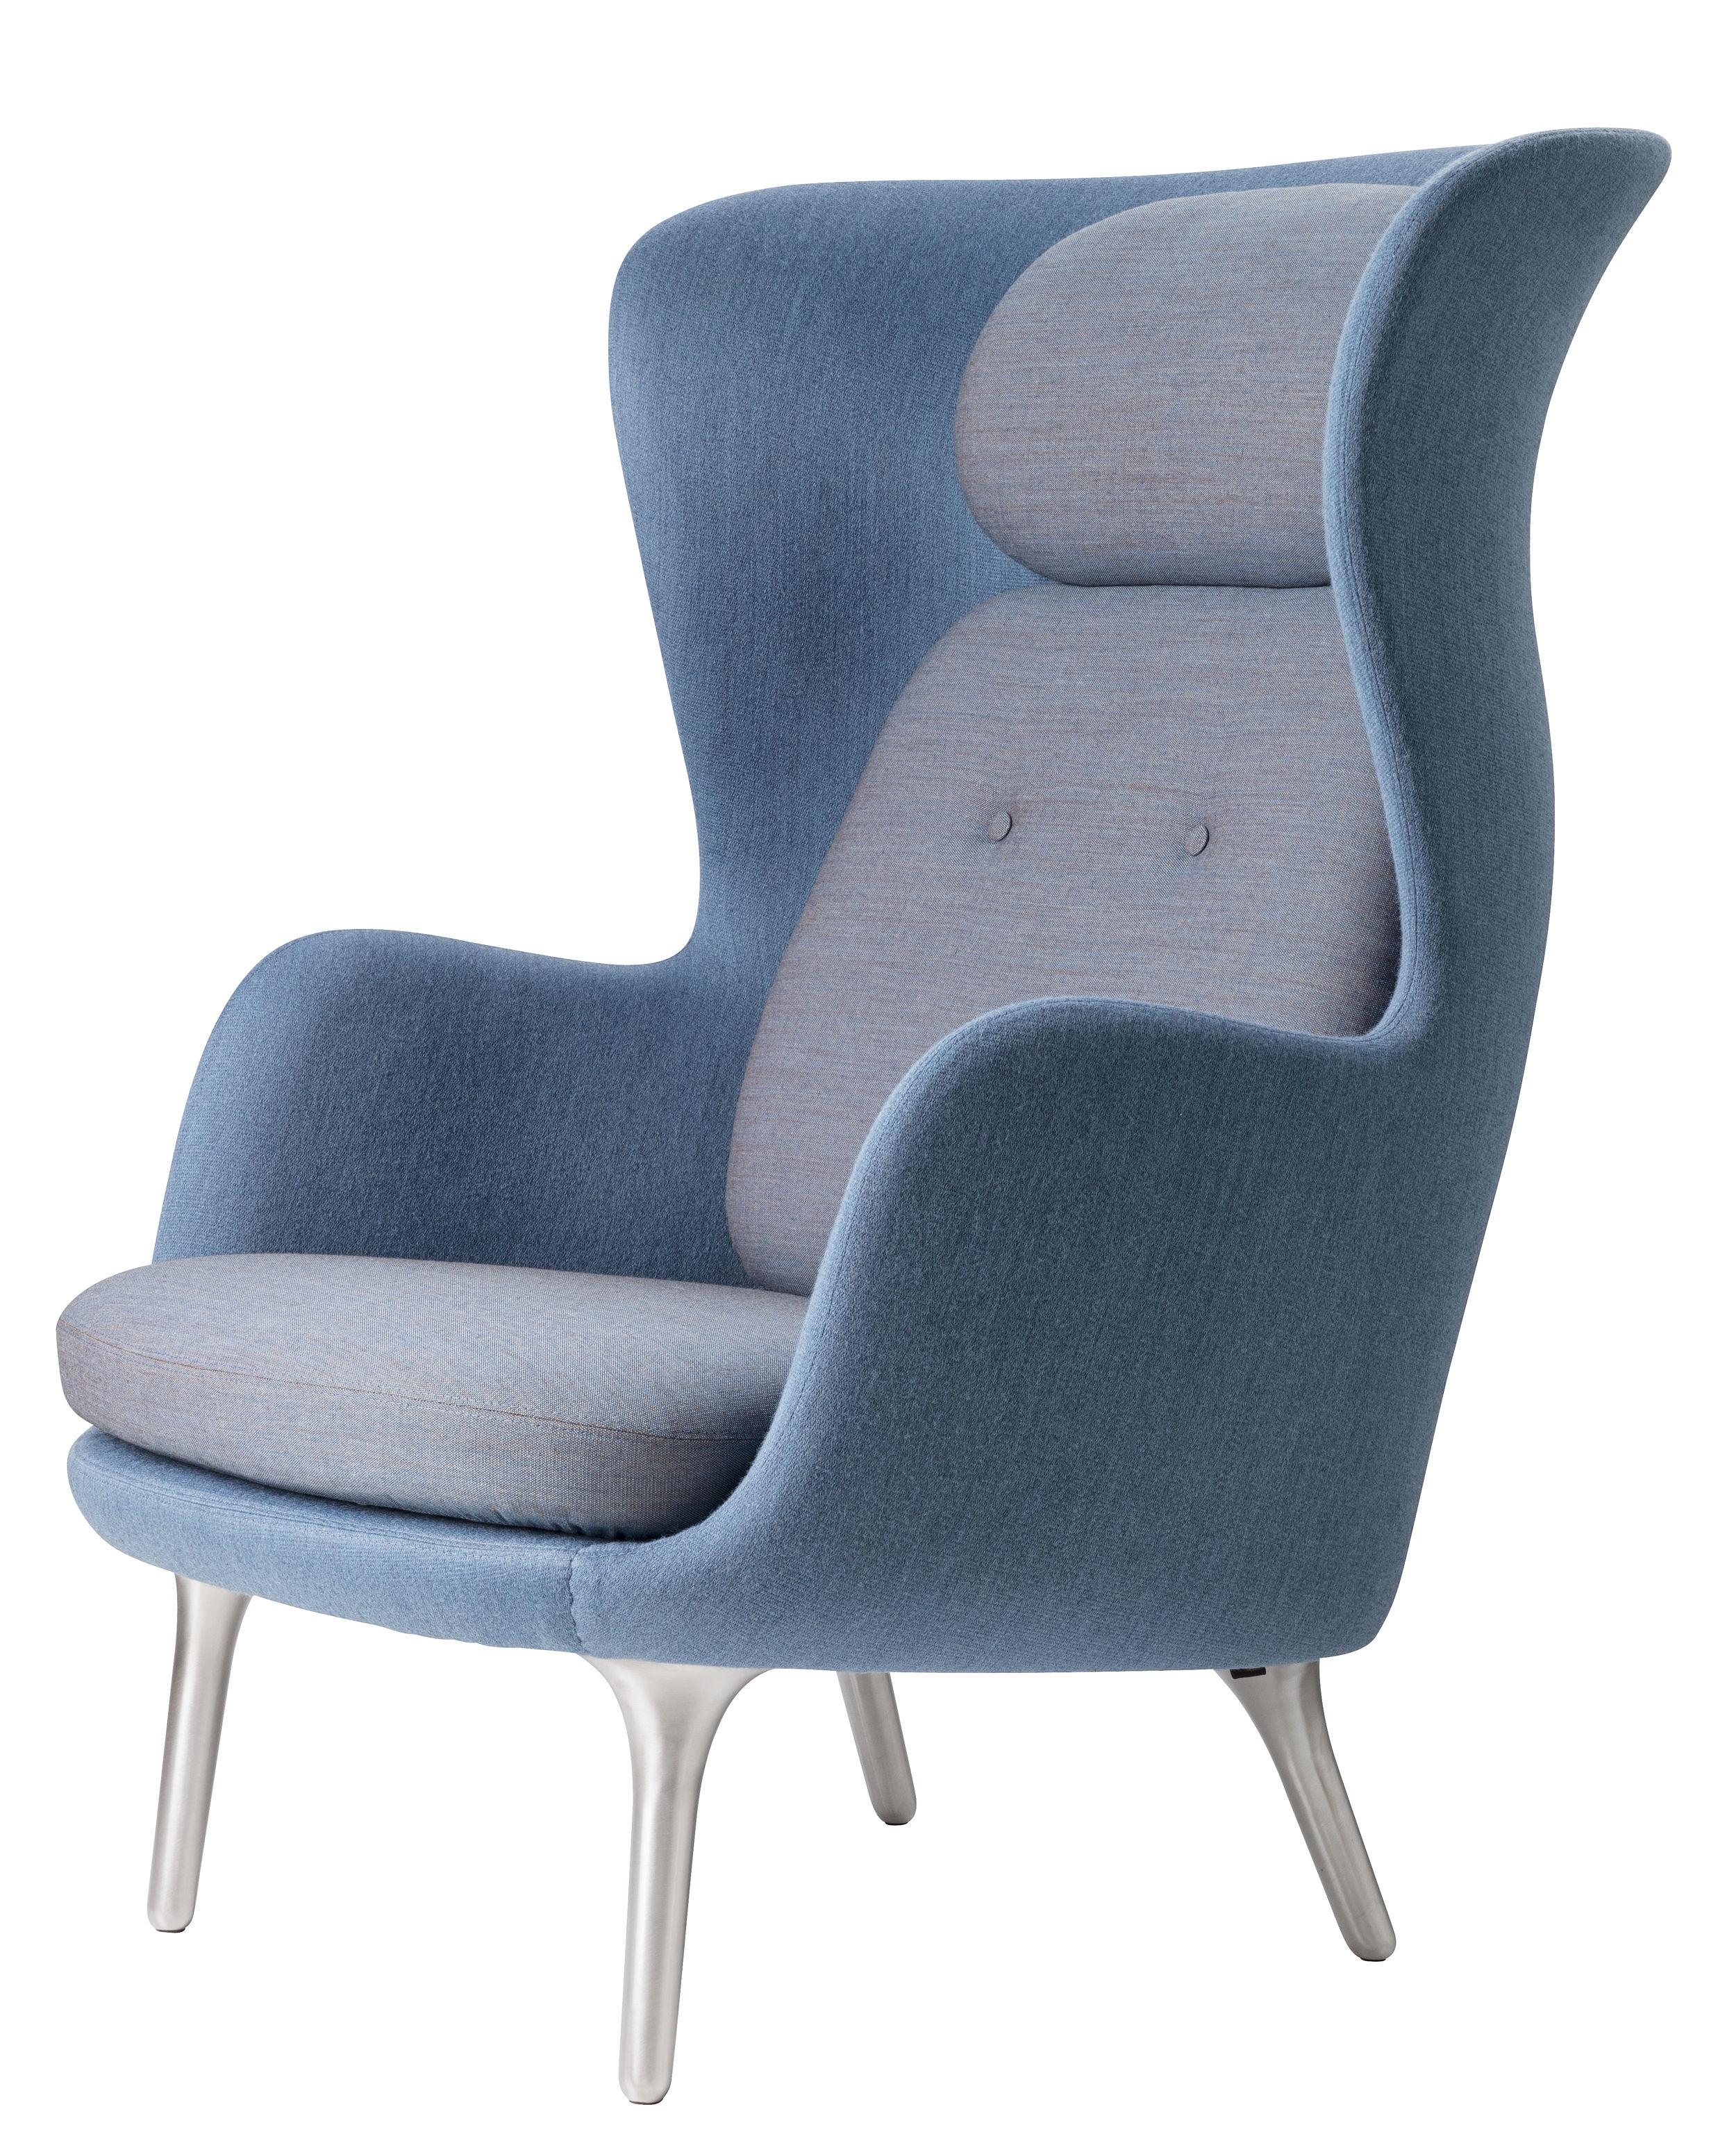 fauteuil rembourr ro tissu bleu assise gris clair fritz hansen. Black Bedroom Furniture Sets. Home Design Ideas